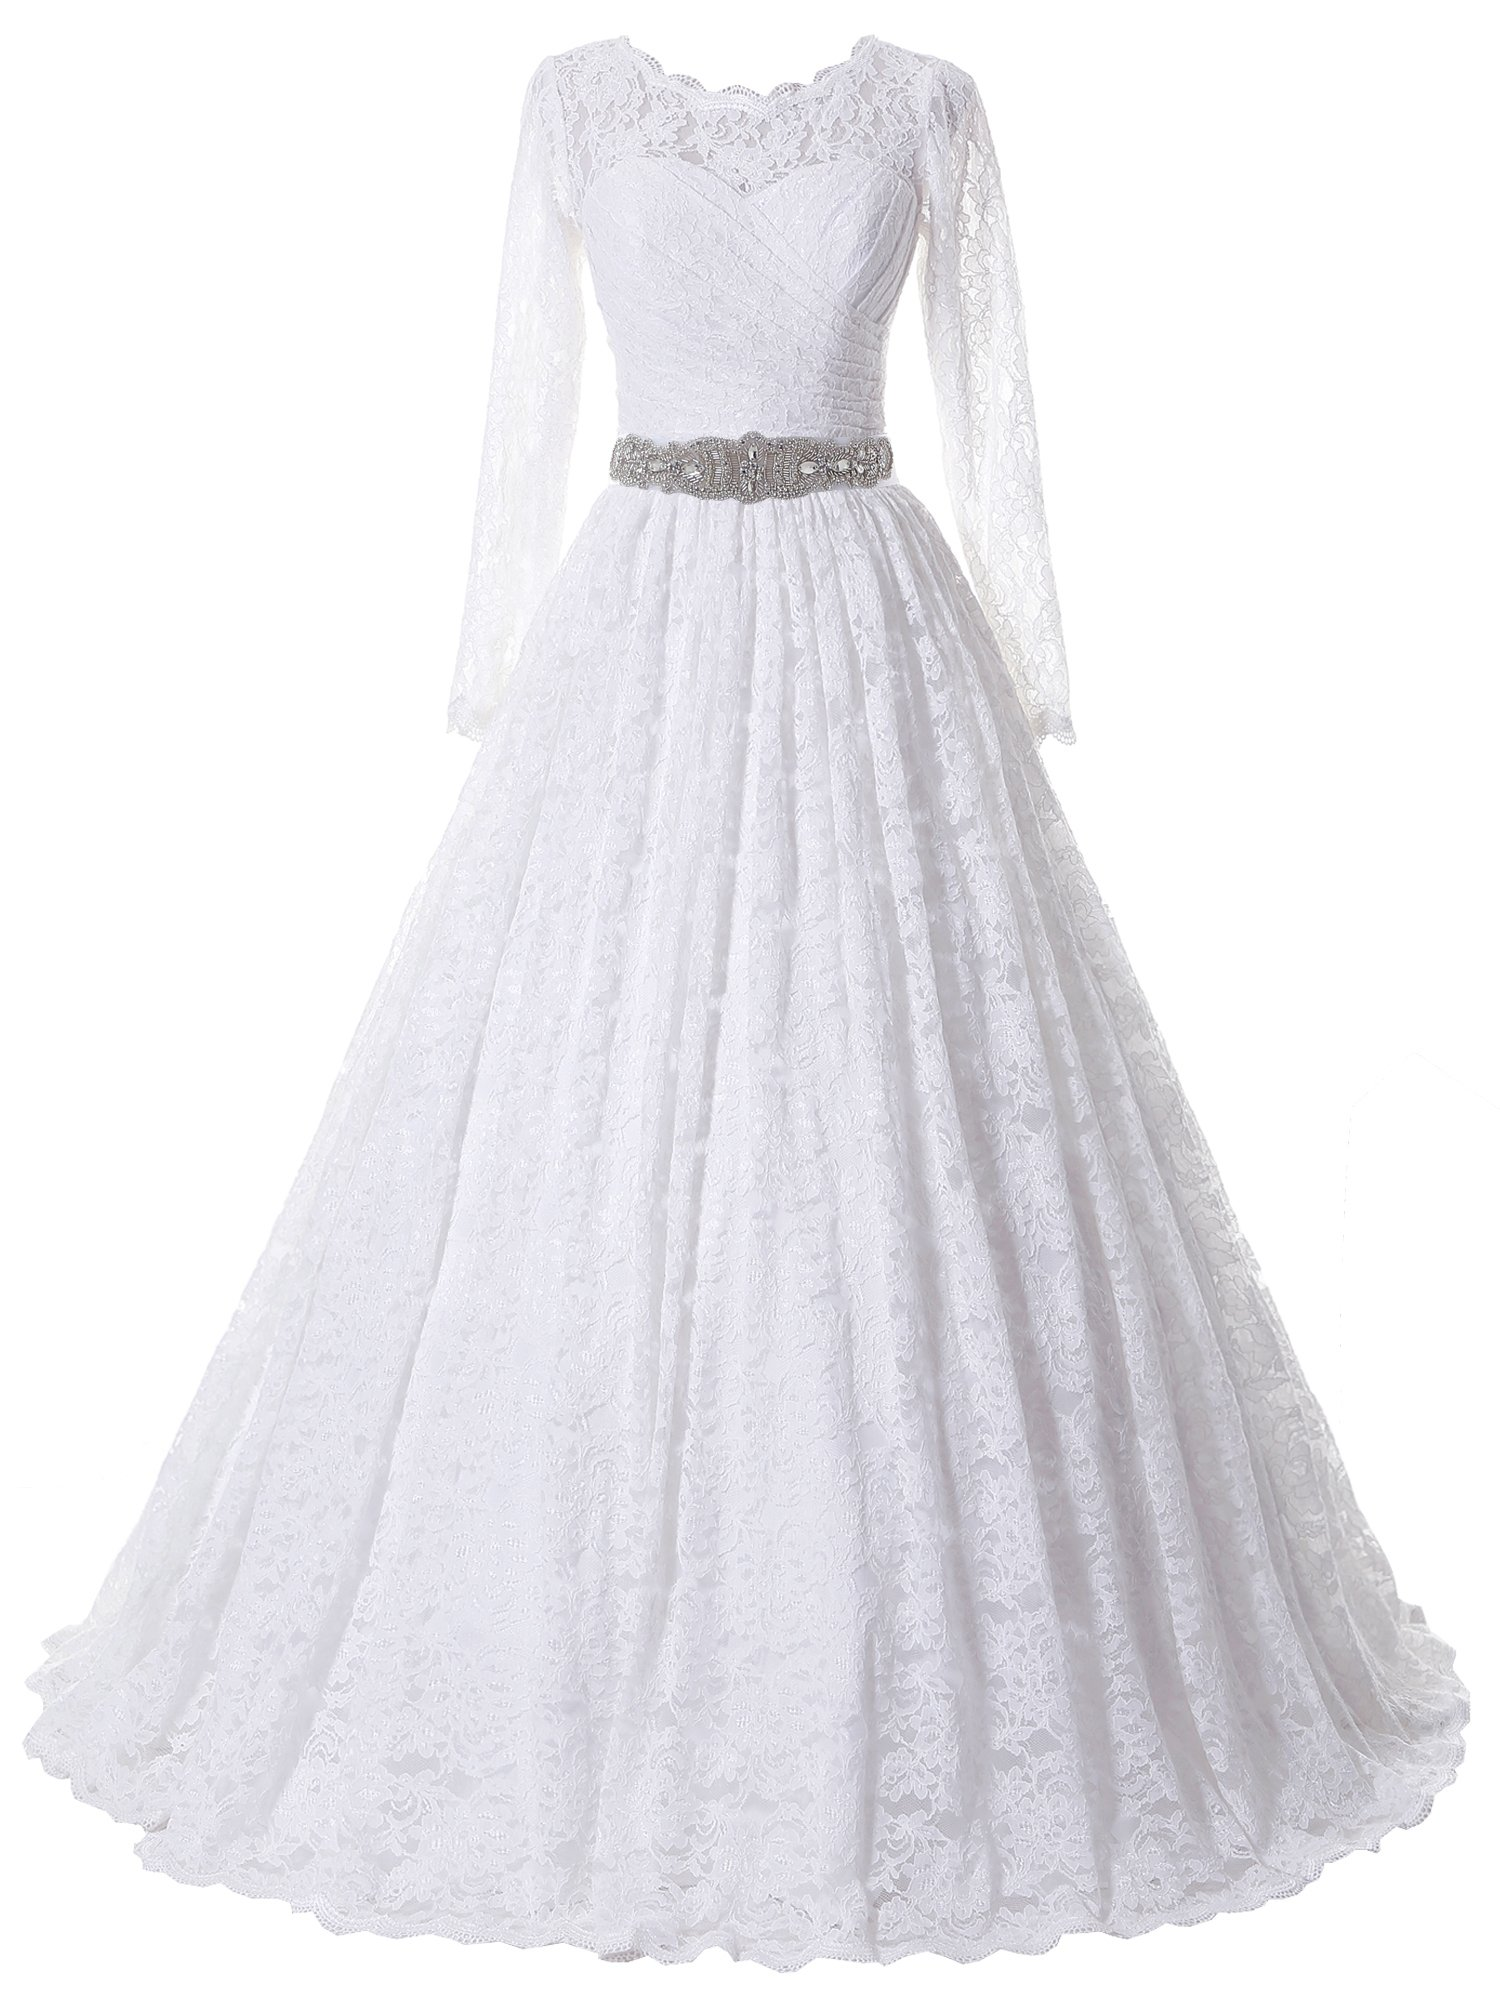 Best Rated In Wedding Dresses & Helpful Customer Reviews